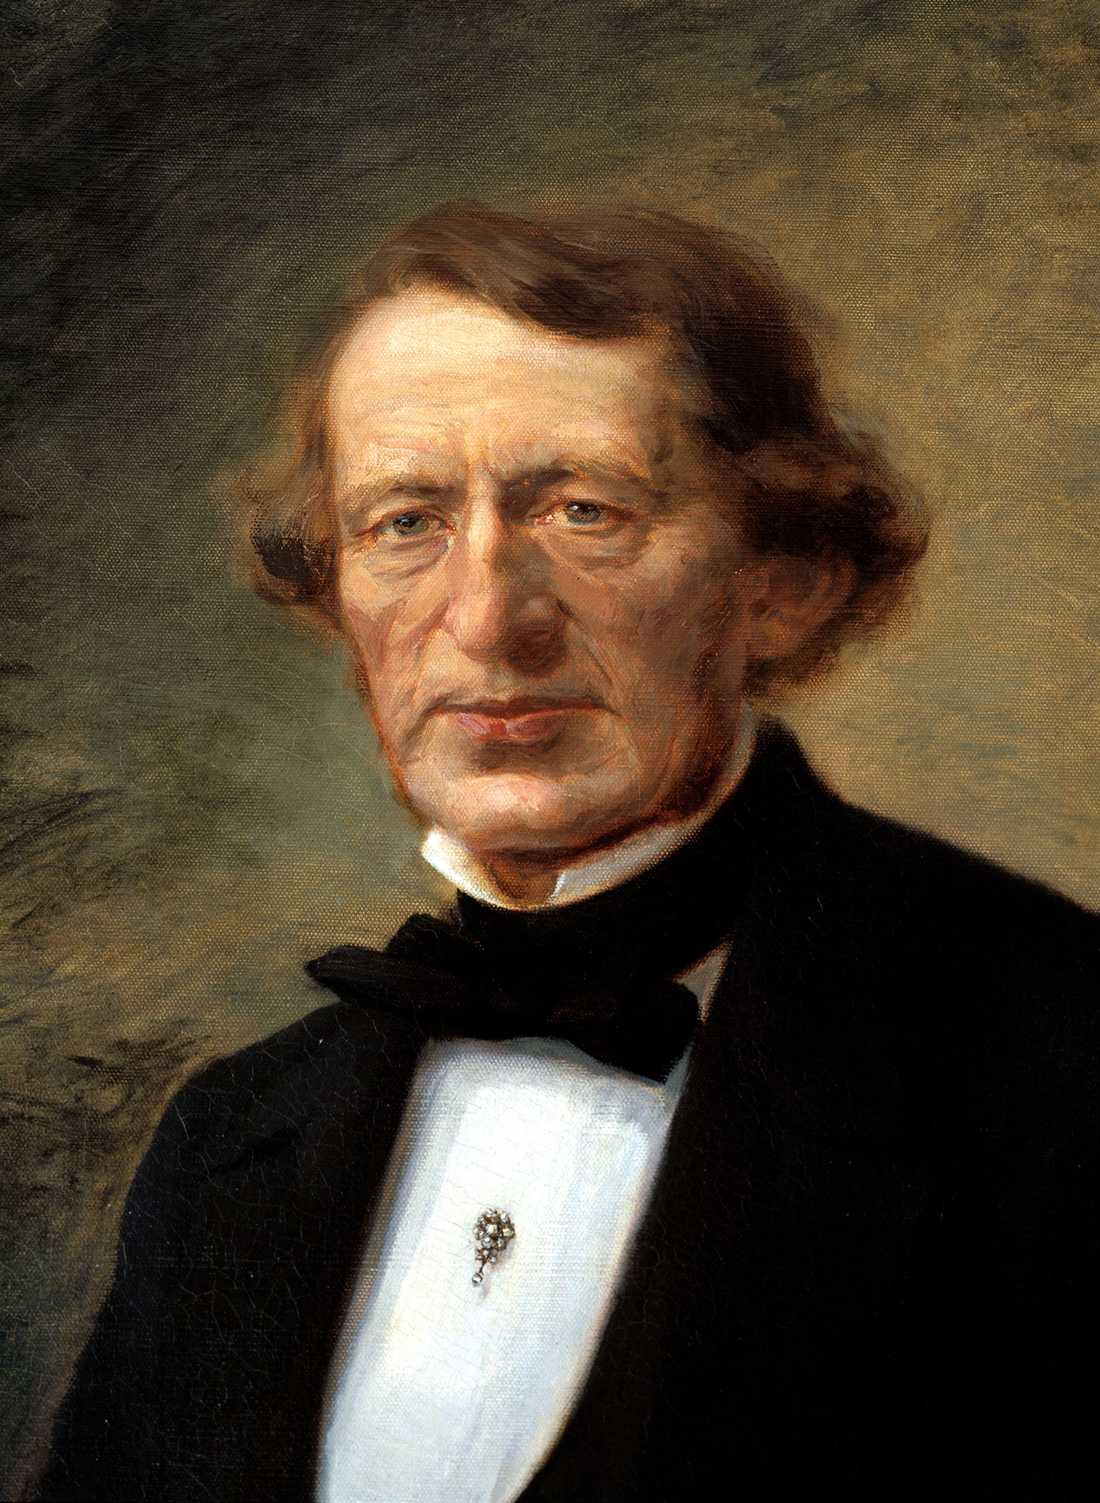 Aftonbladets grundare Lars Johan Hierta.